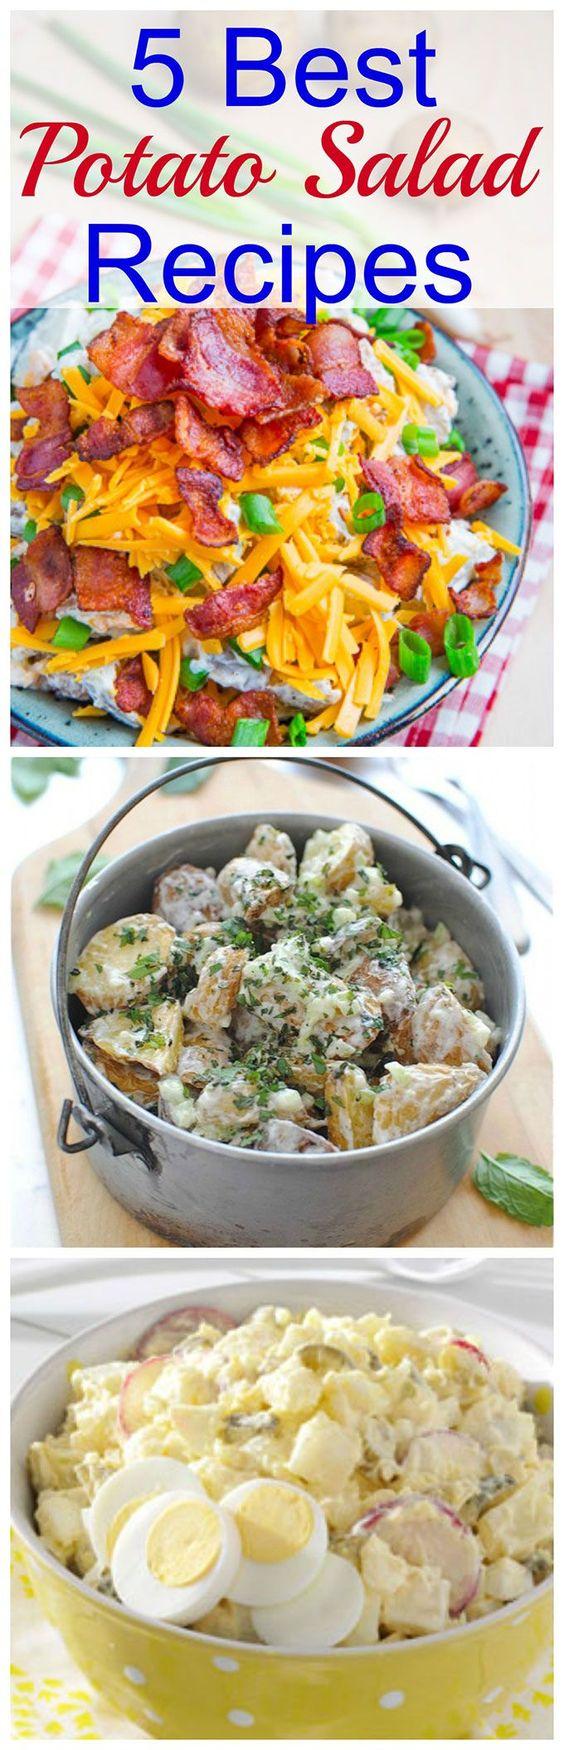 Potato Salads For Summer | Best Potato Salad Recipe, Potato Salad ...